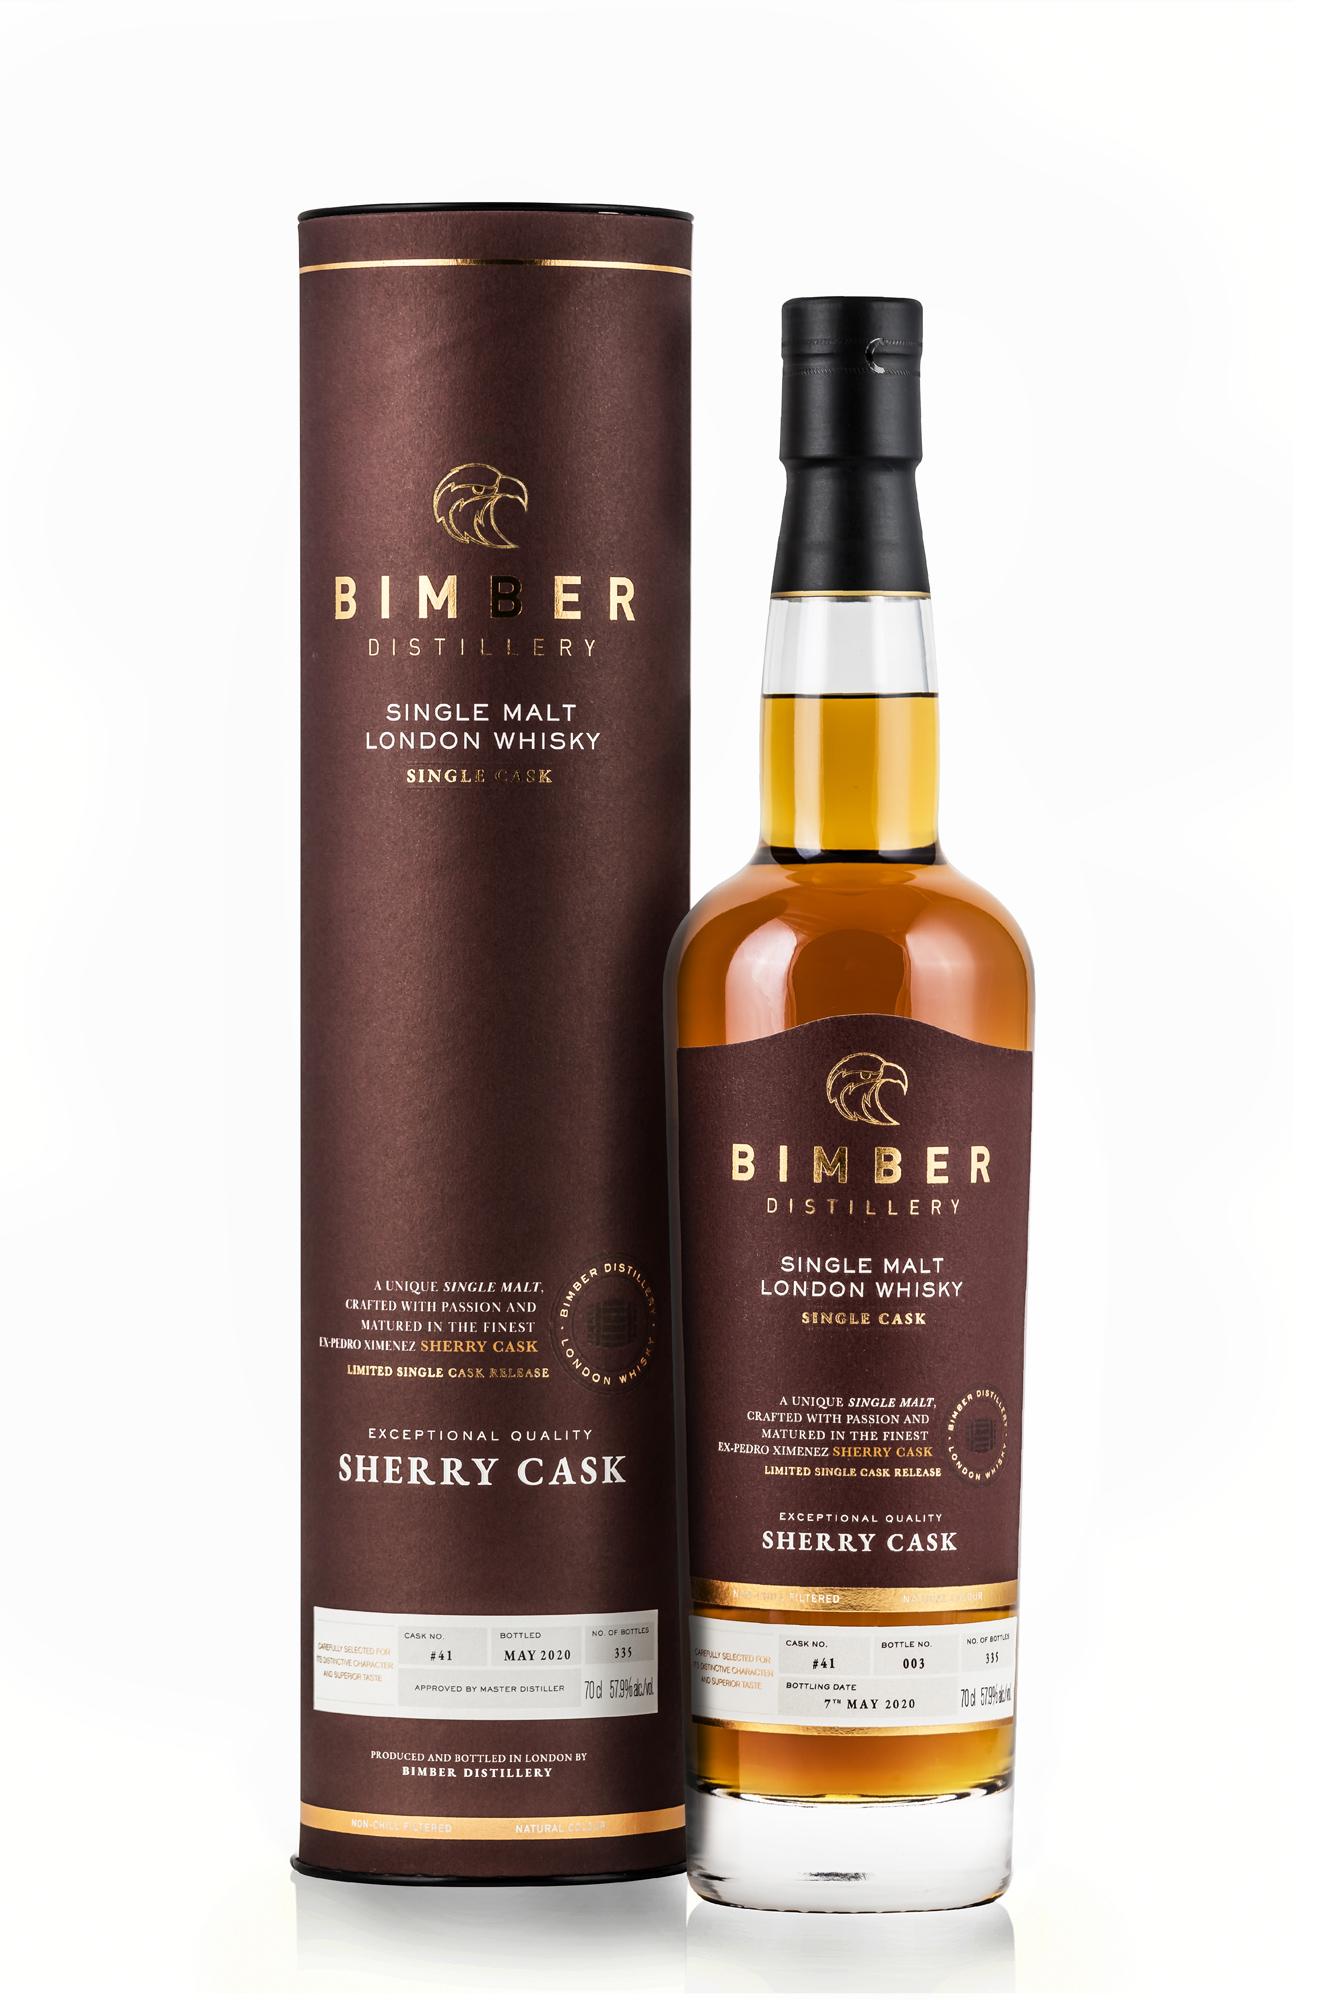 Bimber Sherry Cask #41